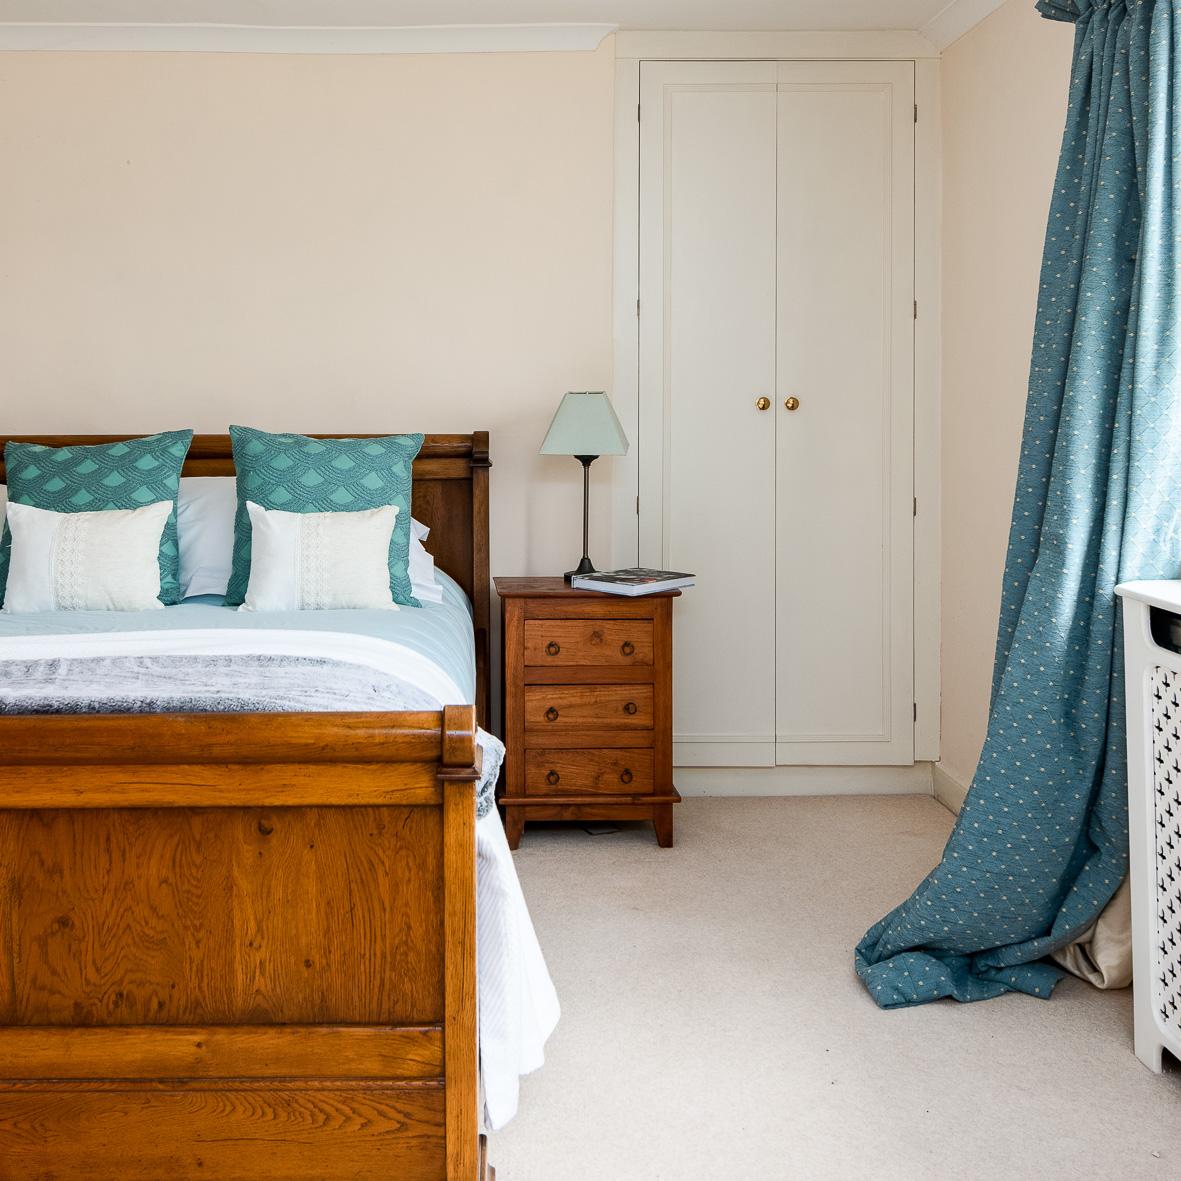 19. 190301-363 Master Bedroom atmos